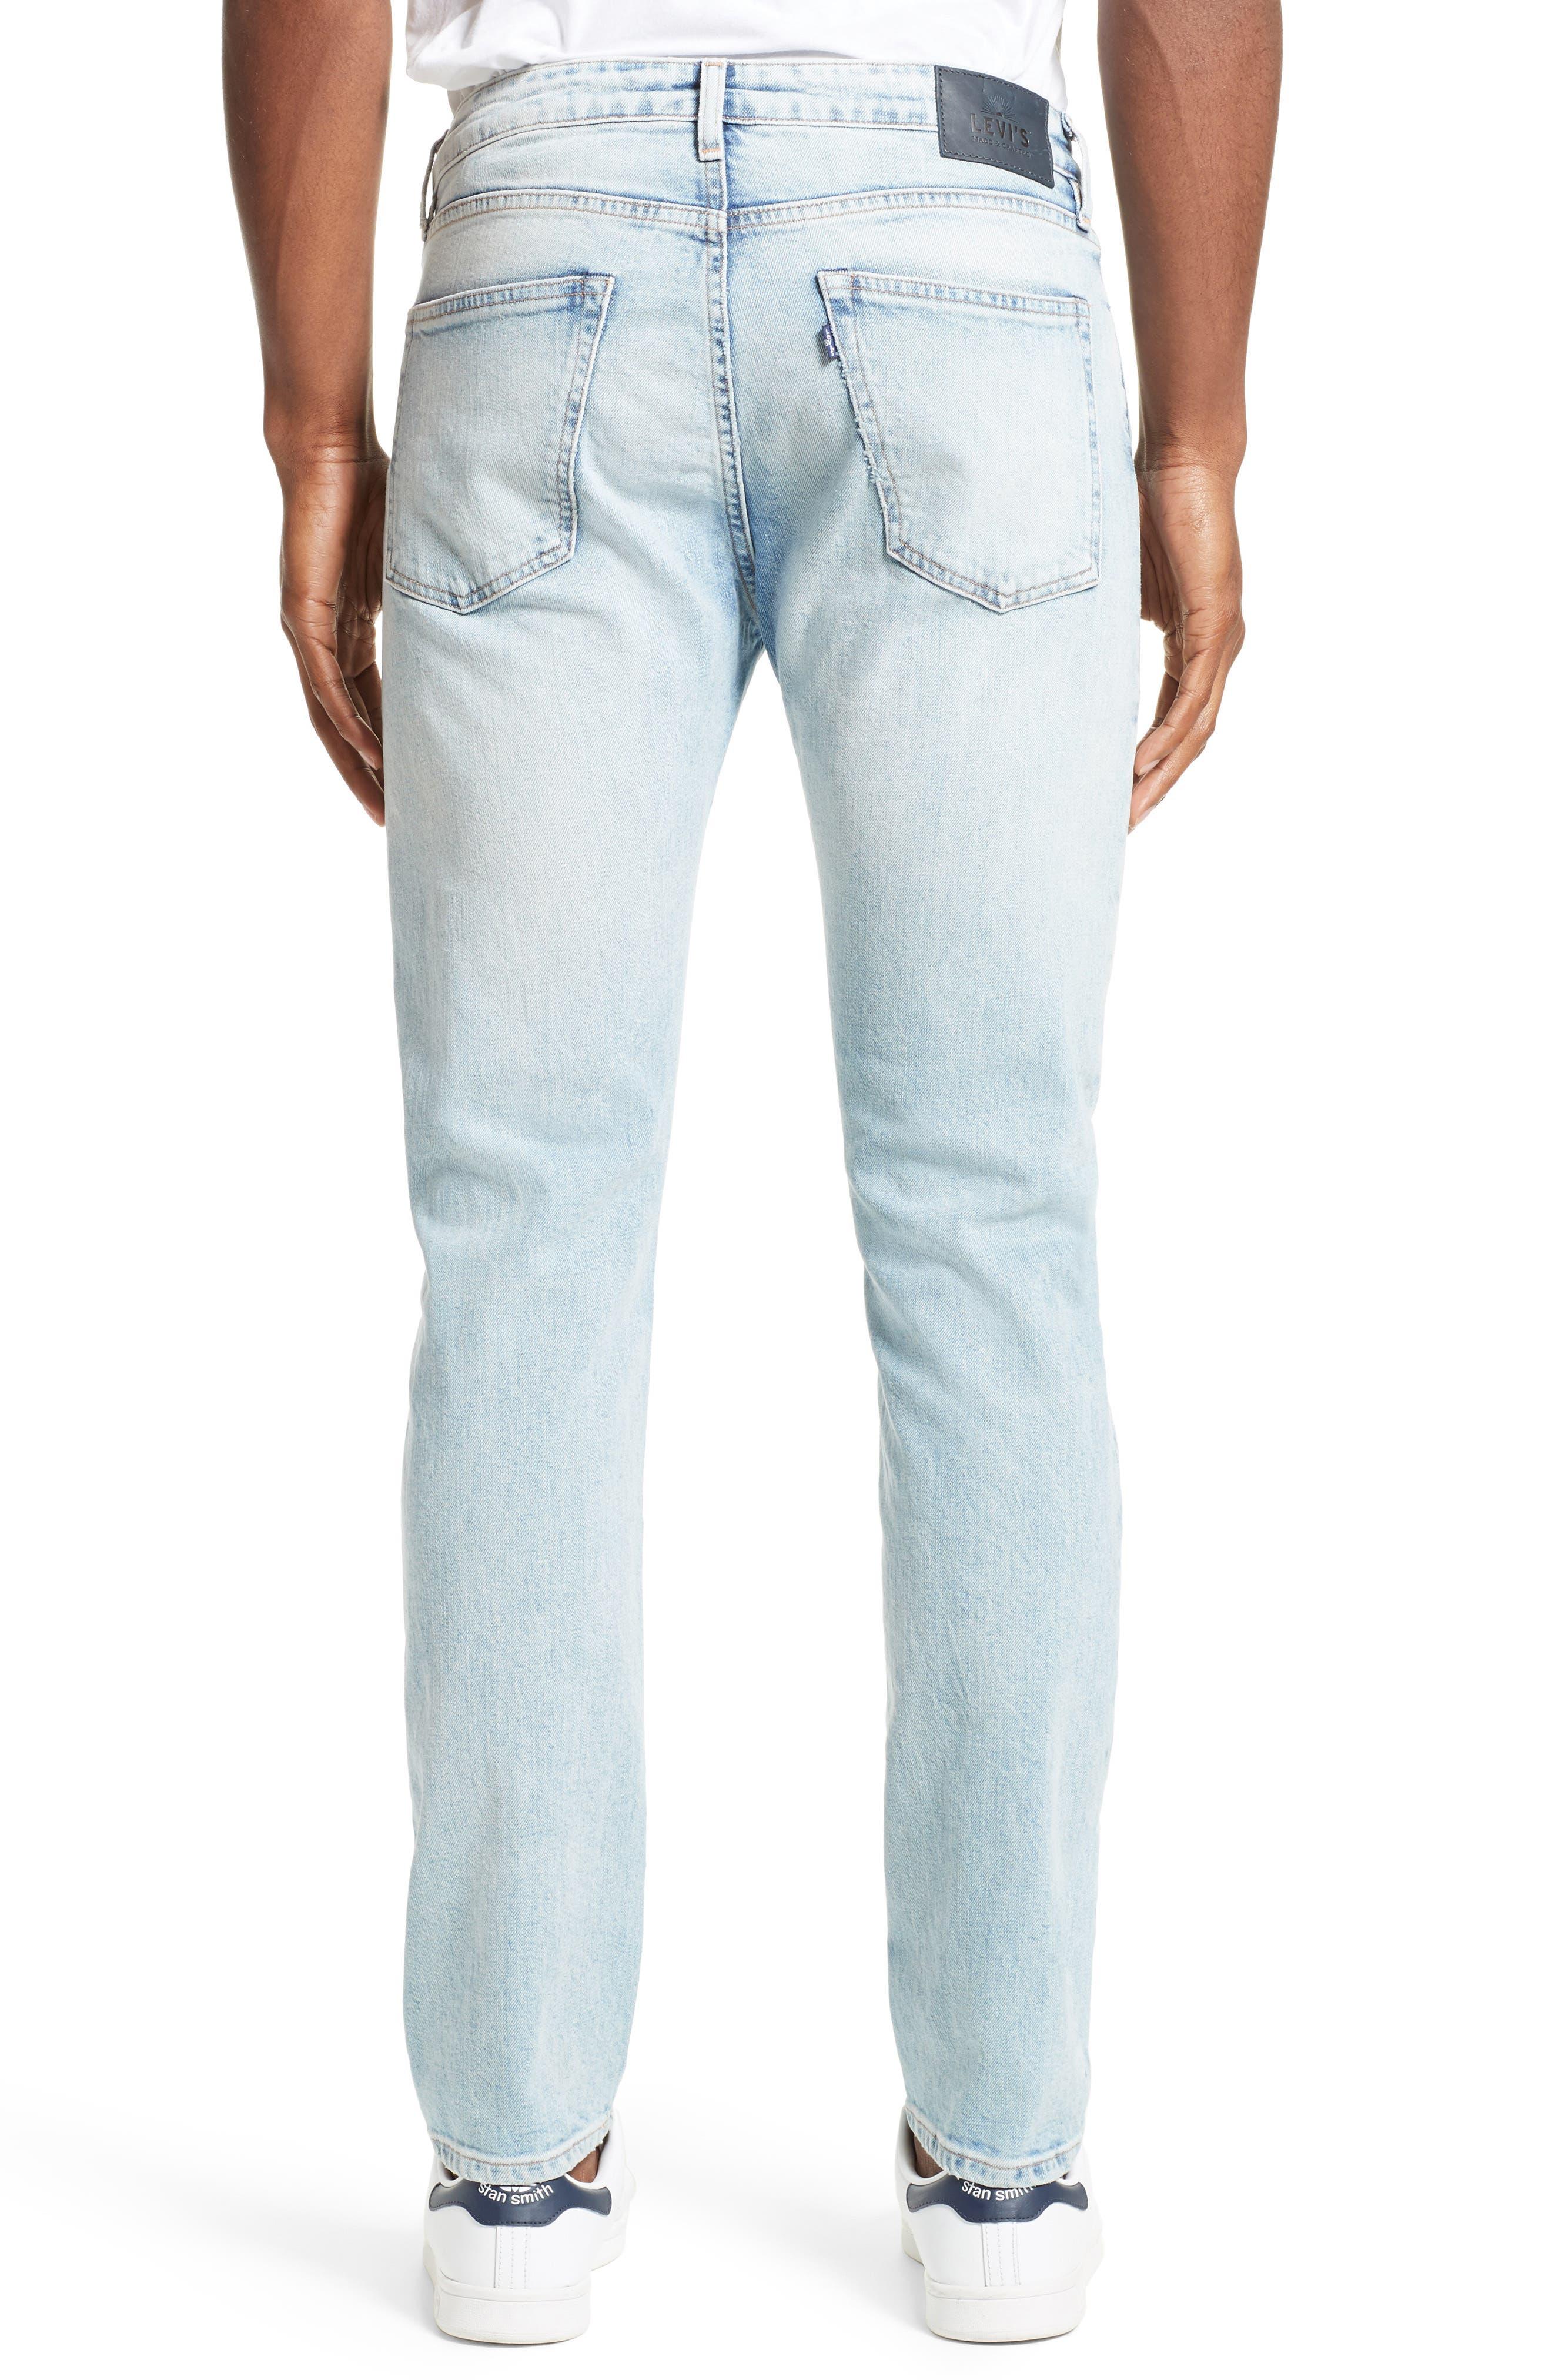 Tack Slim Fit Jeans,                             Alternate thumbnail 2, color,                             450